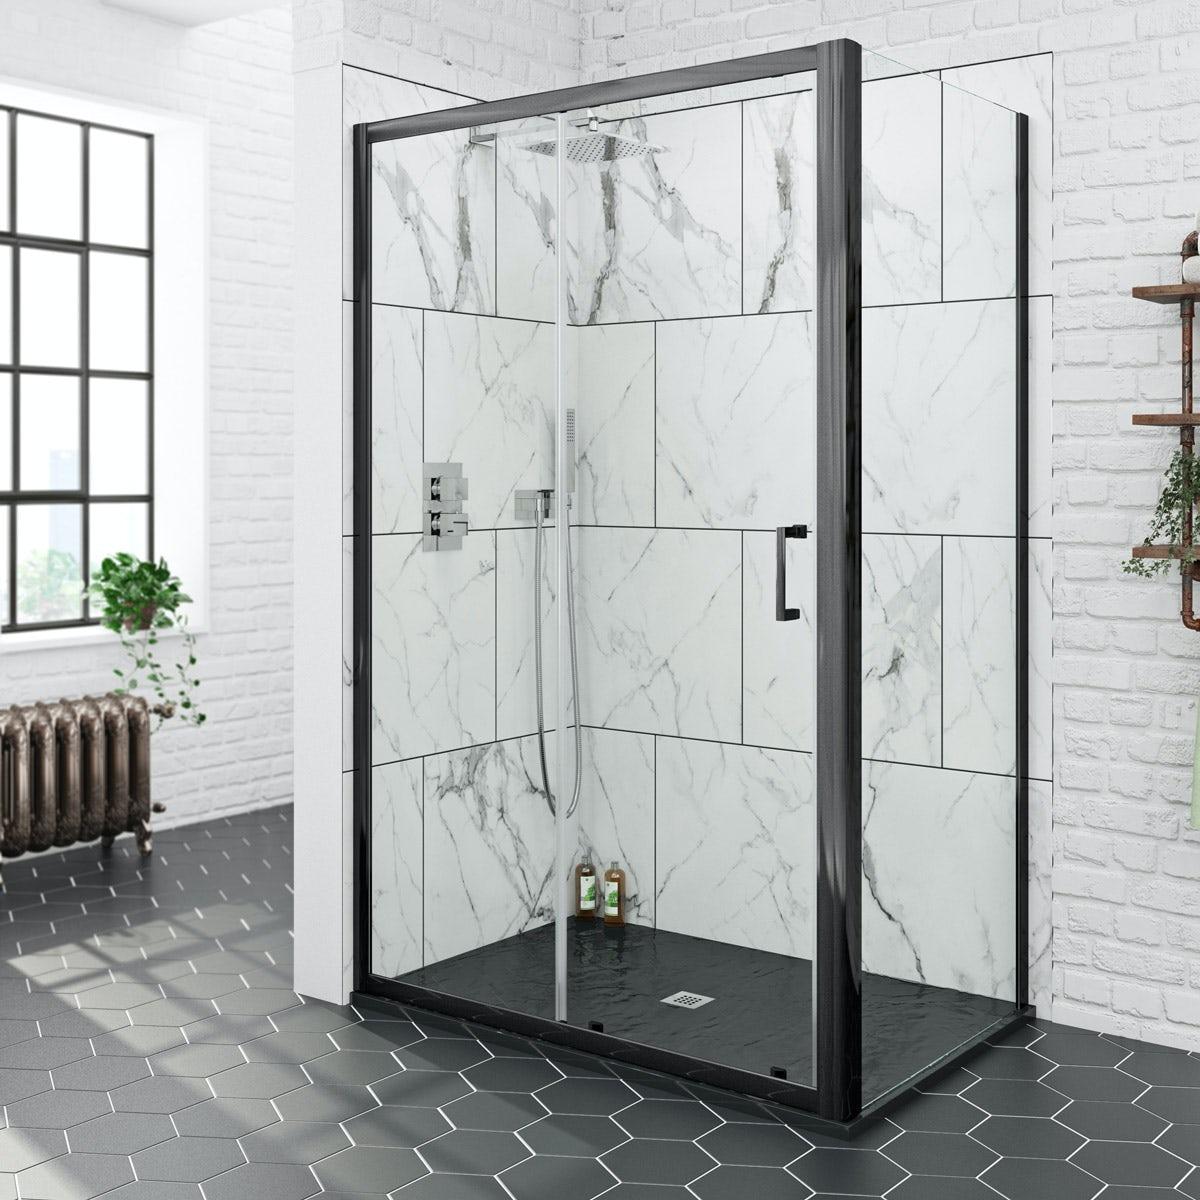 Mode black 6mm sliding shower enclosure with black slate effect tray 1200 x 800